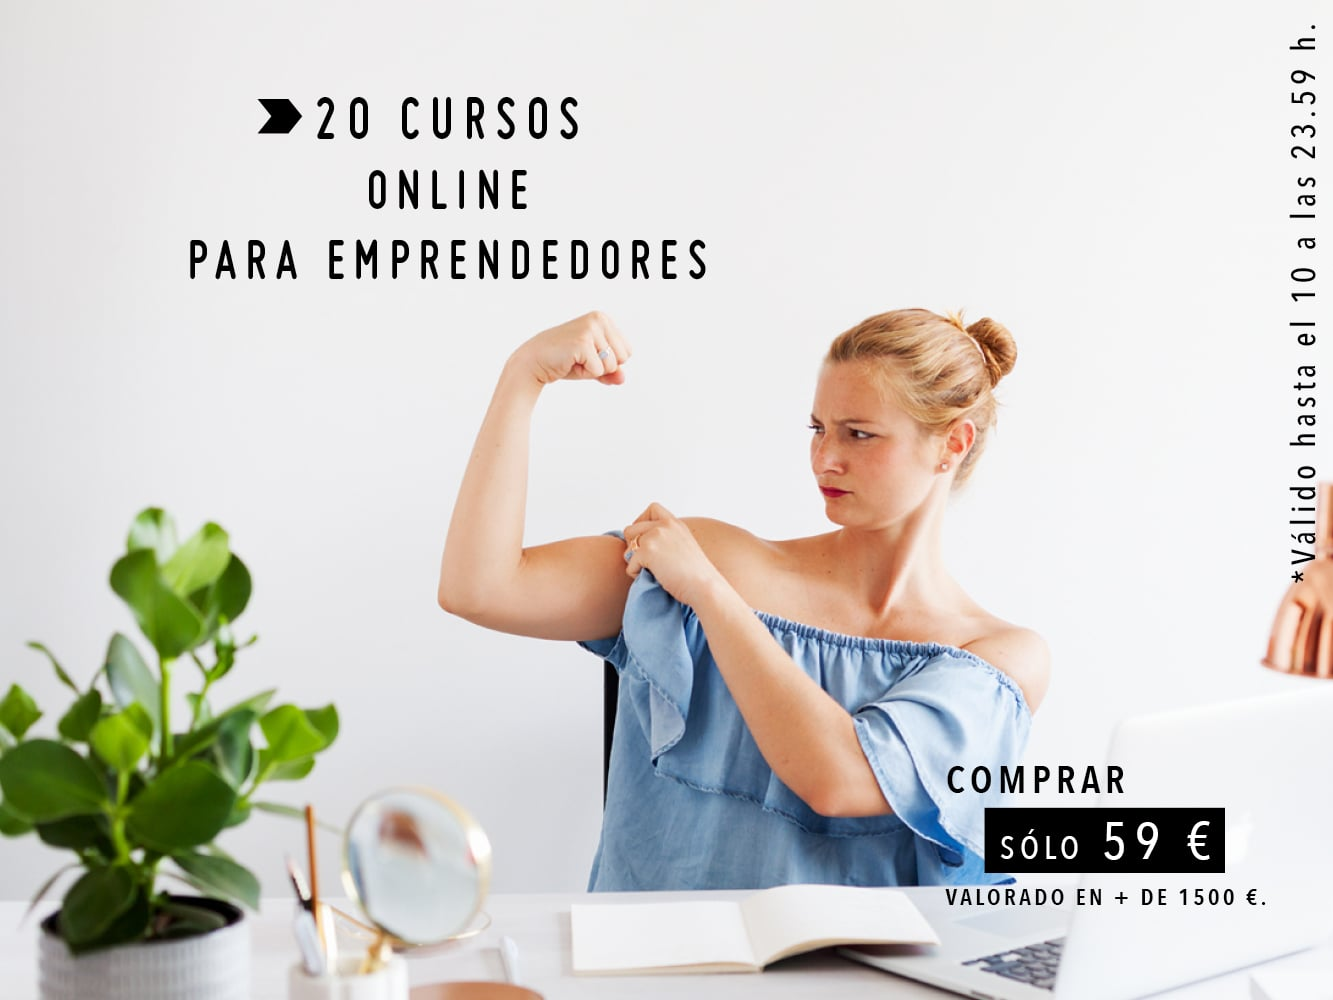 Bundle 20 cursos para emprendedores